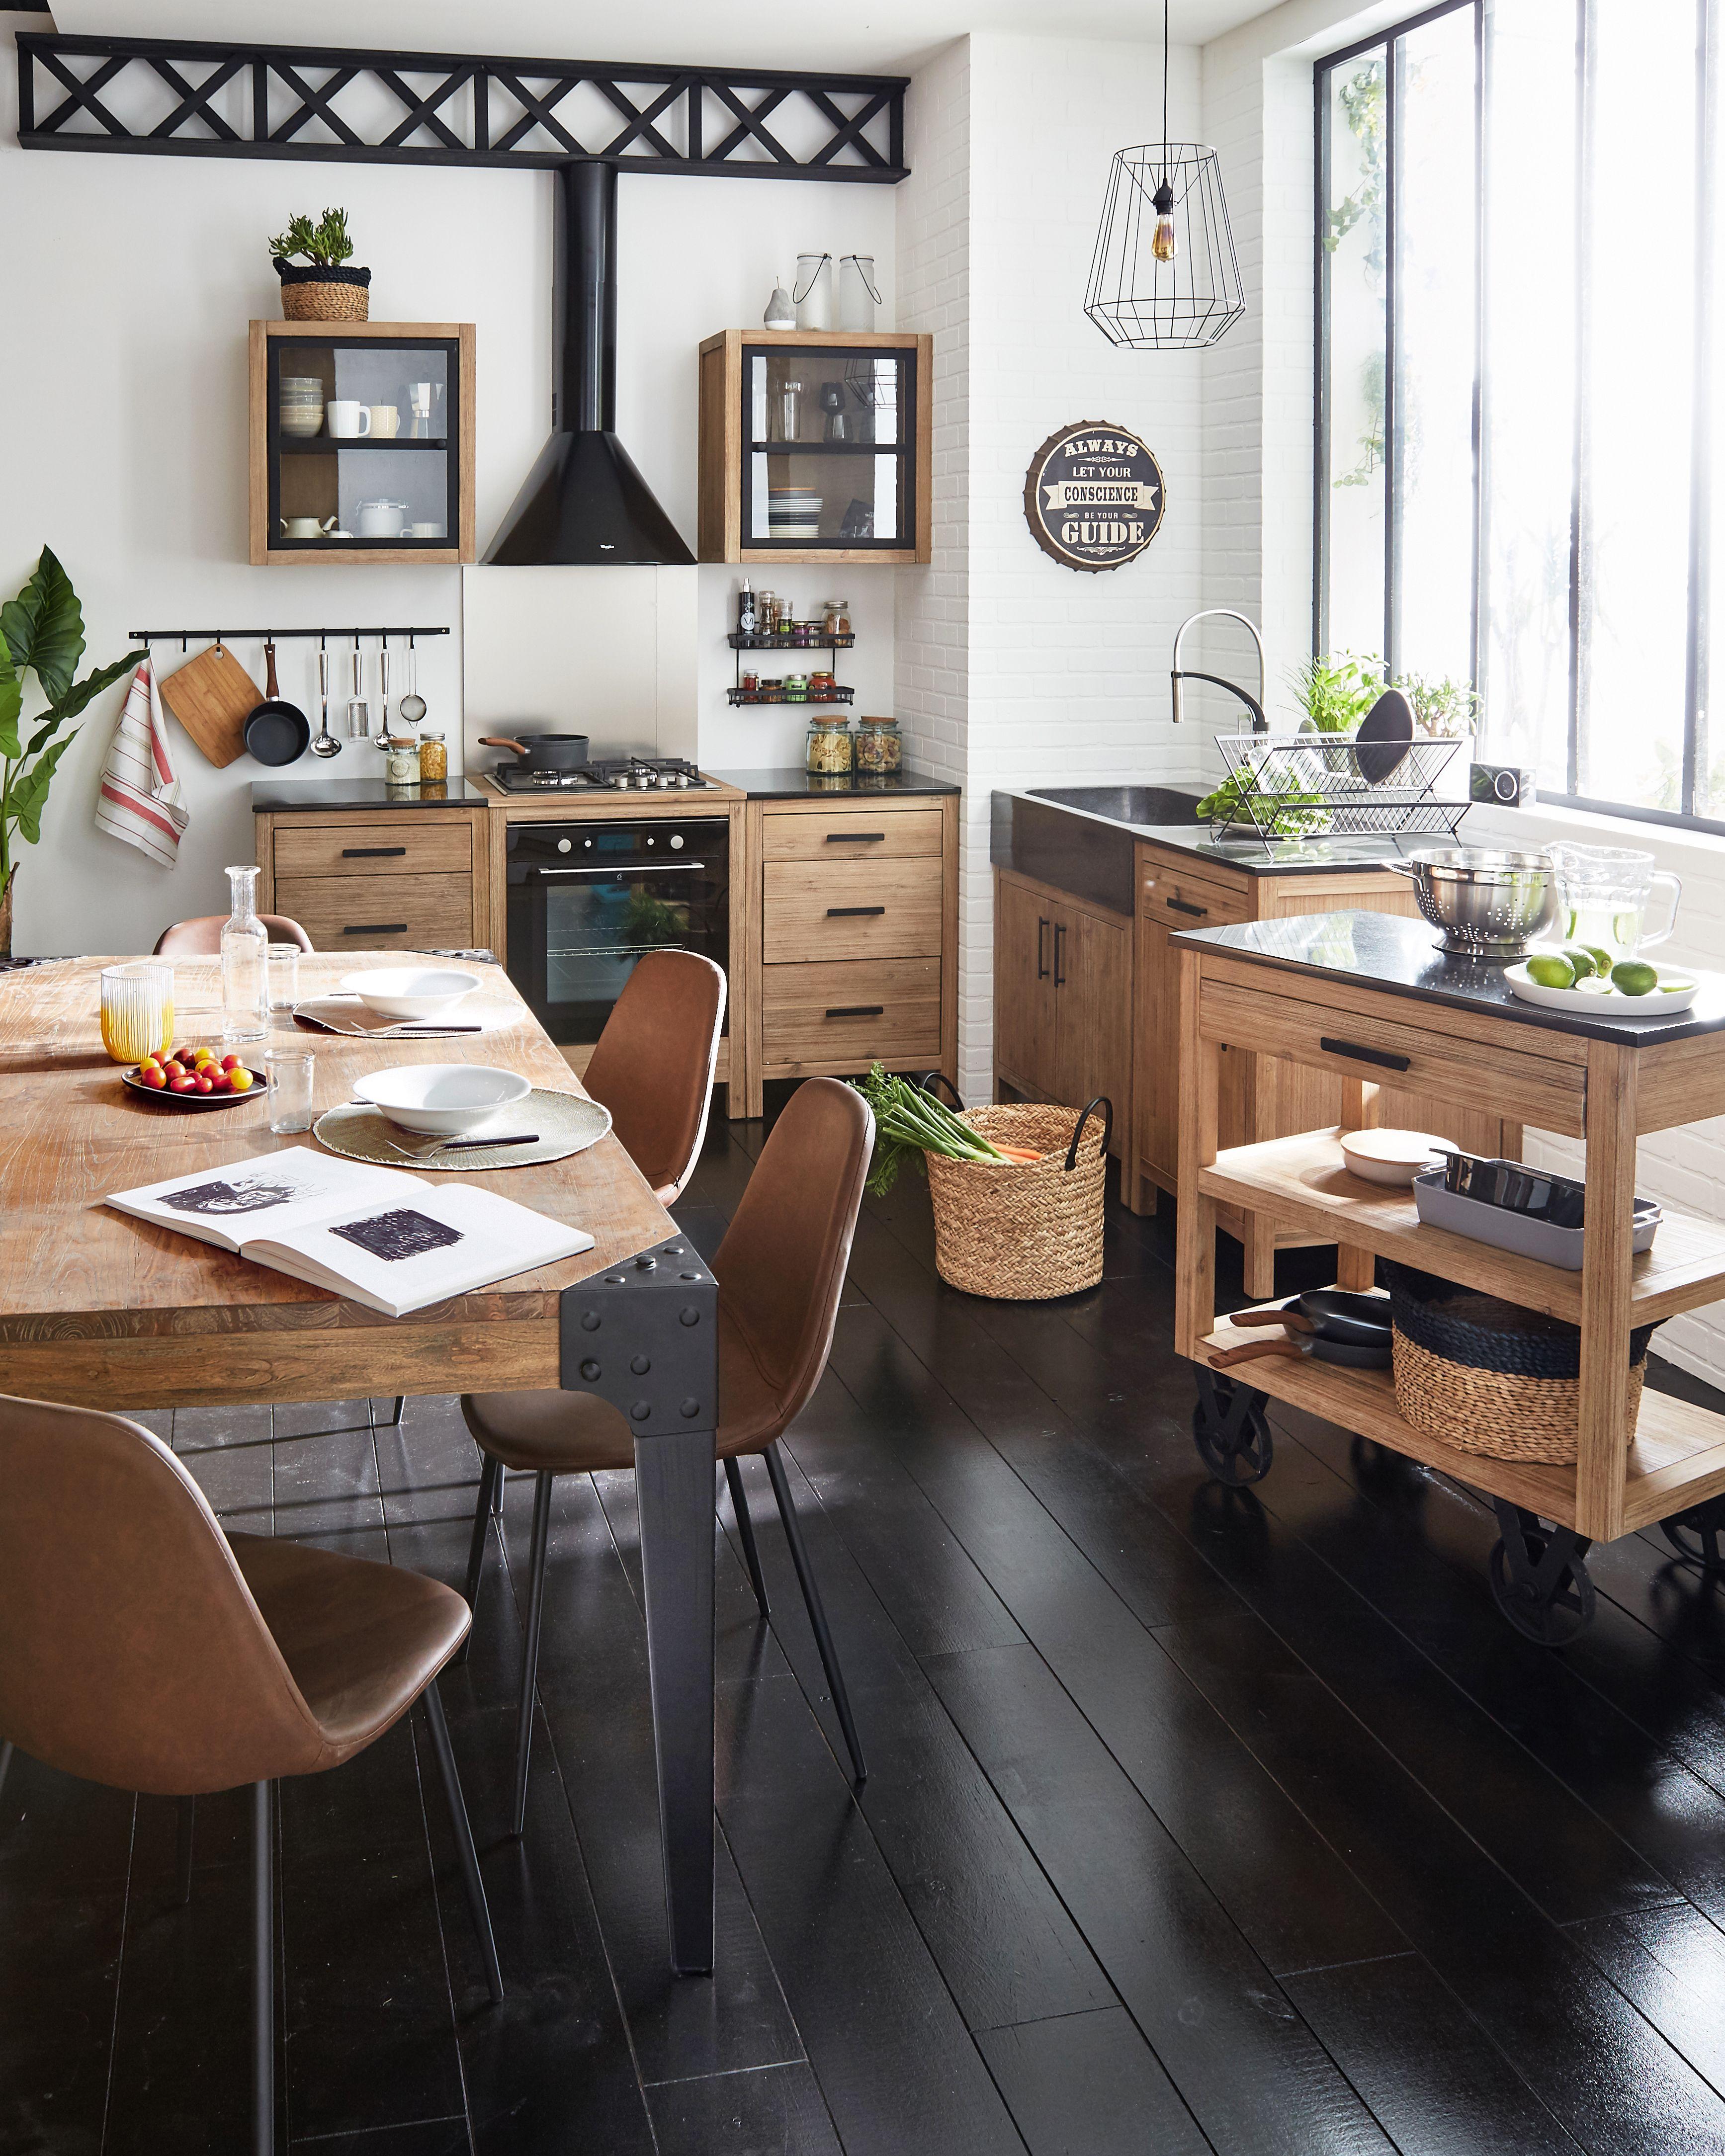 Ambiance Industrielle Alinea Idee Amenagement Cuisine Meuble Deco Salle De Cuisine